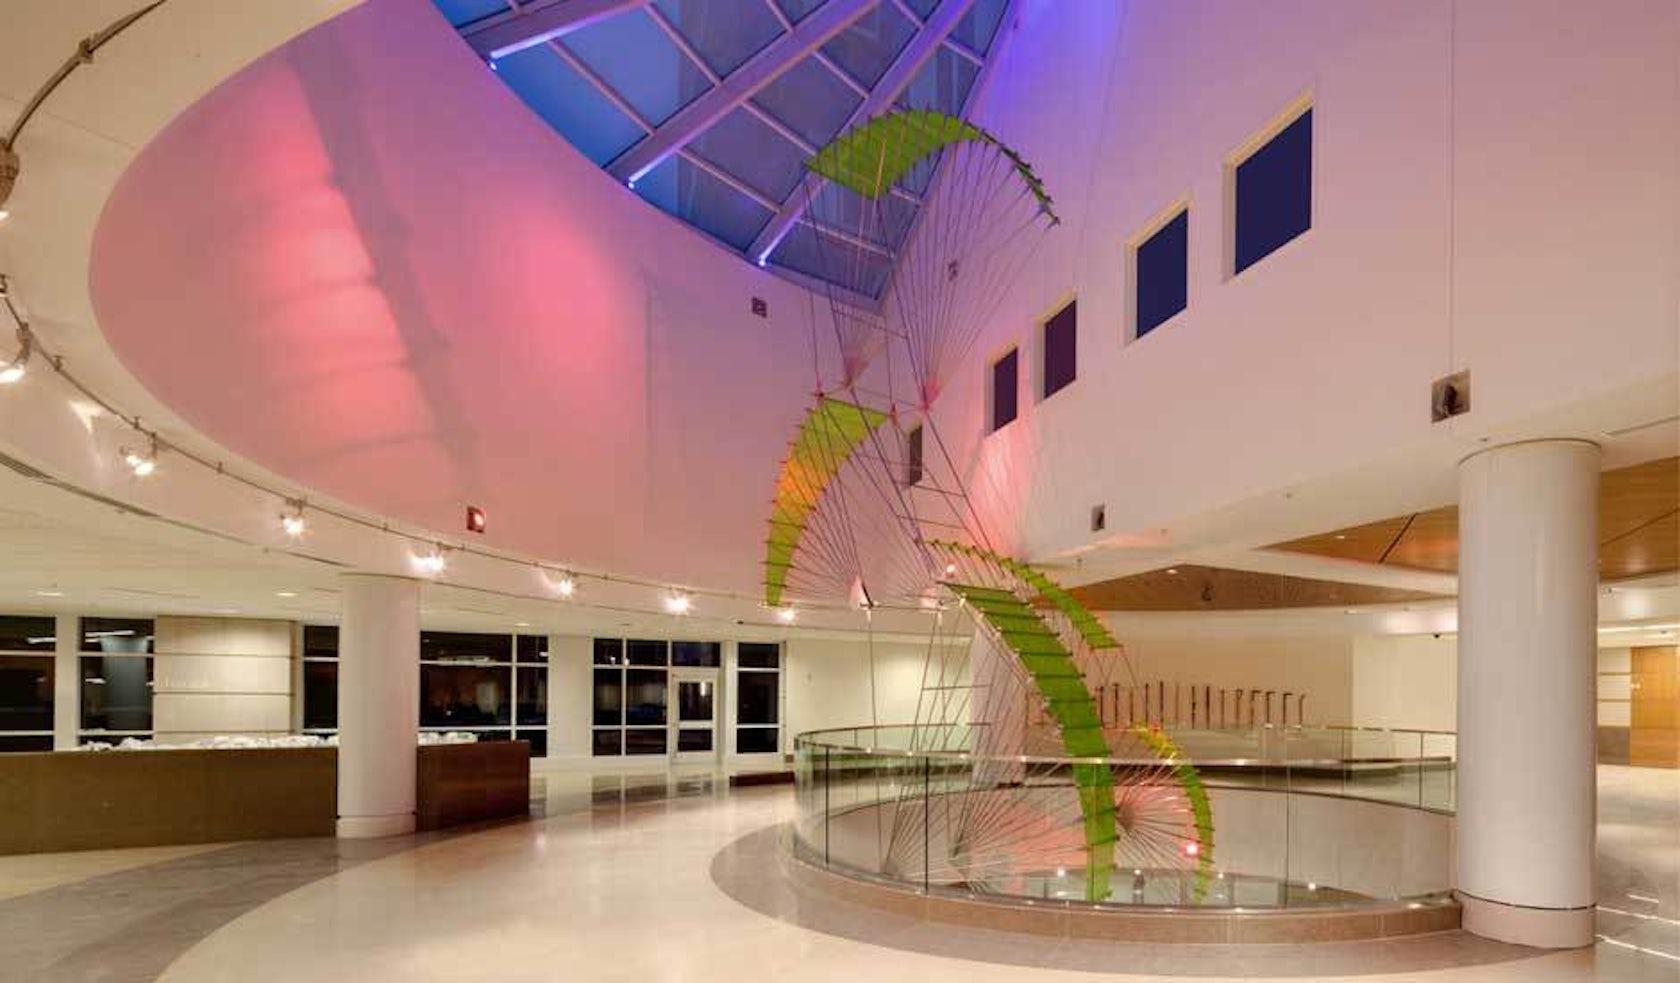 University of kentucky hospital patient care facility for Central motors lexington ky